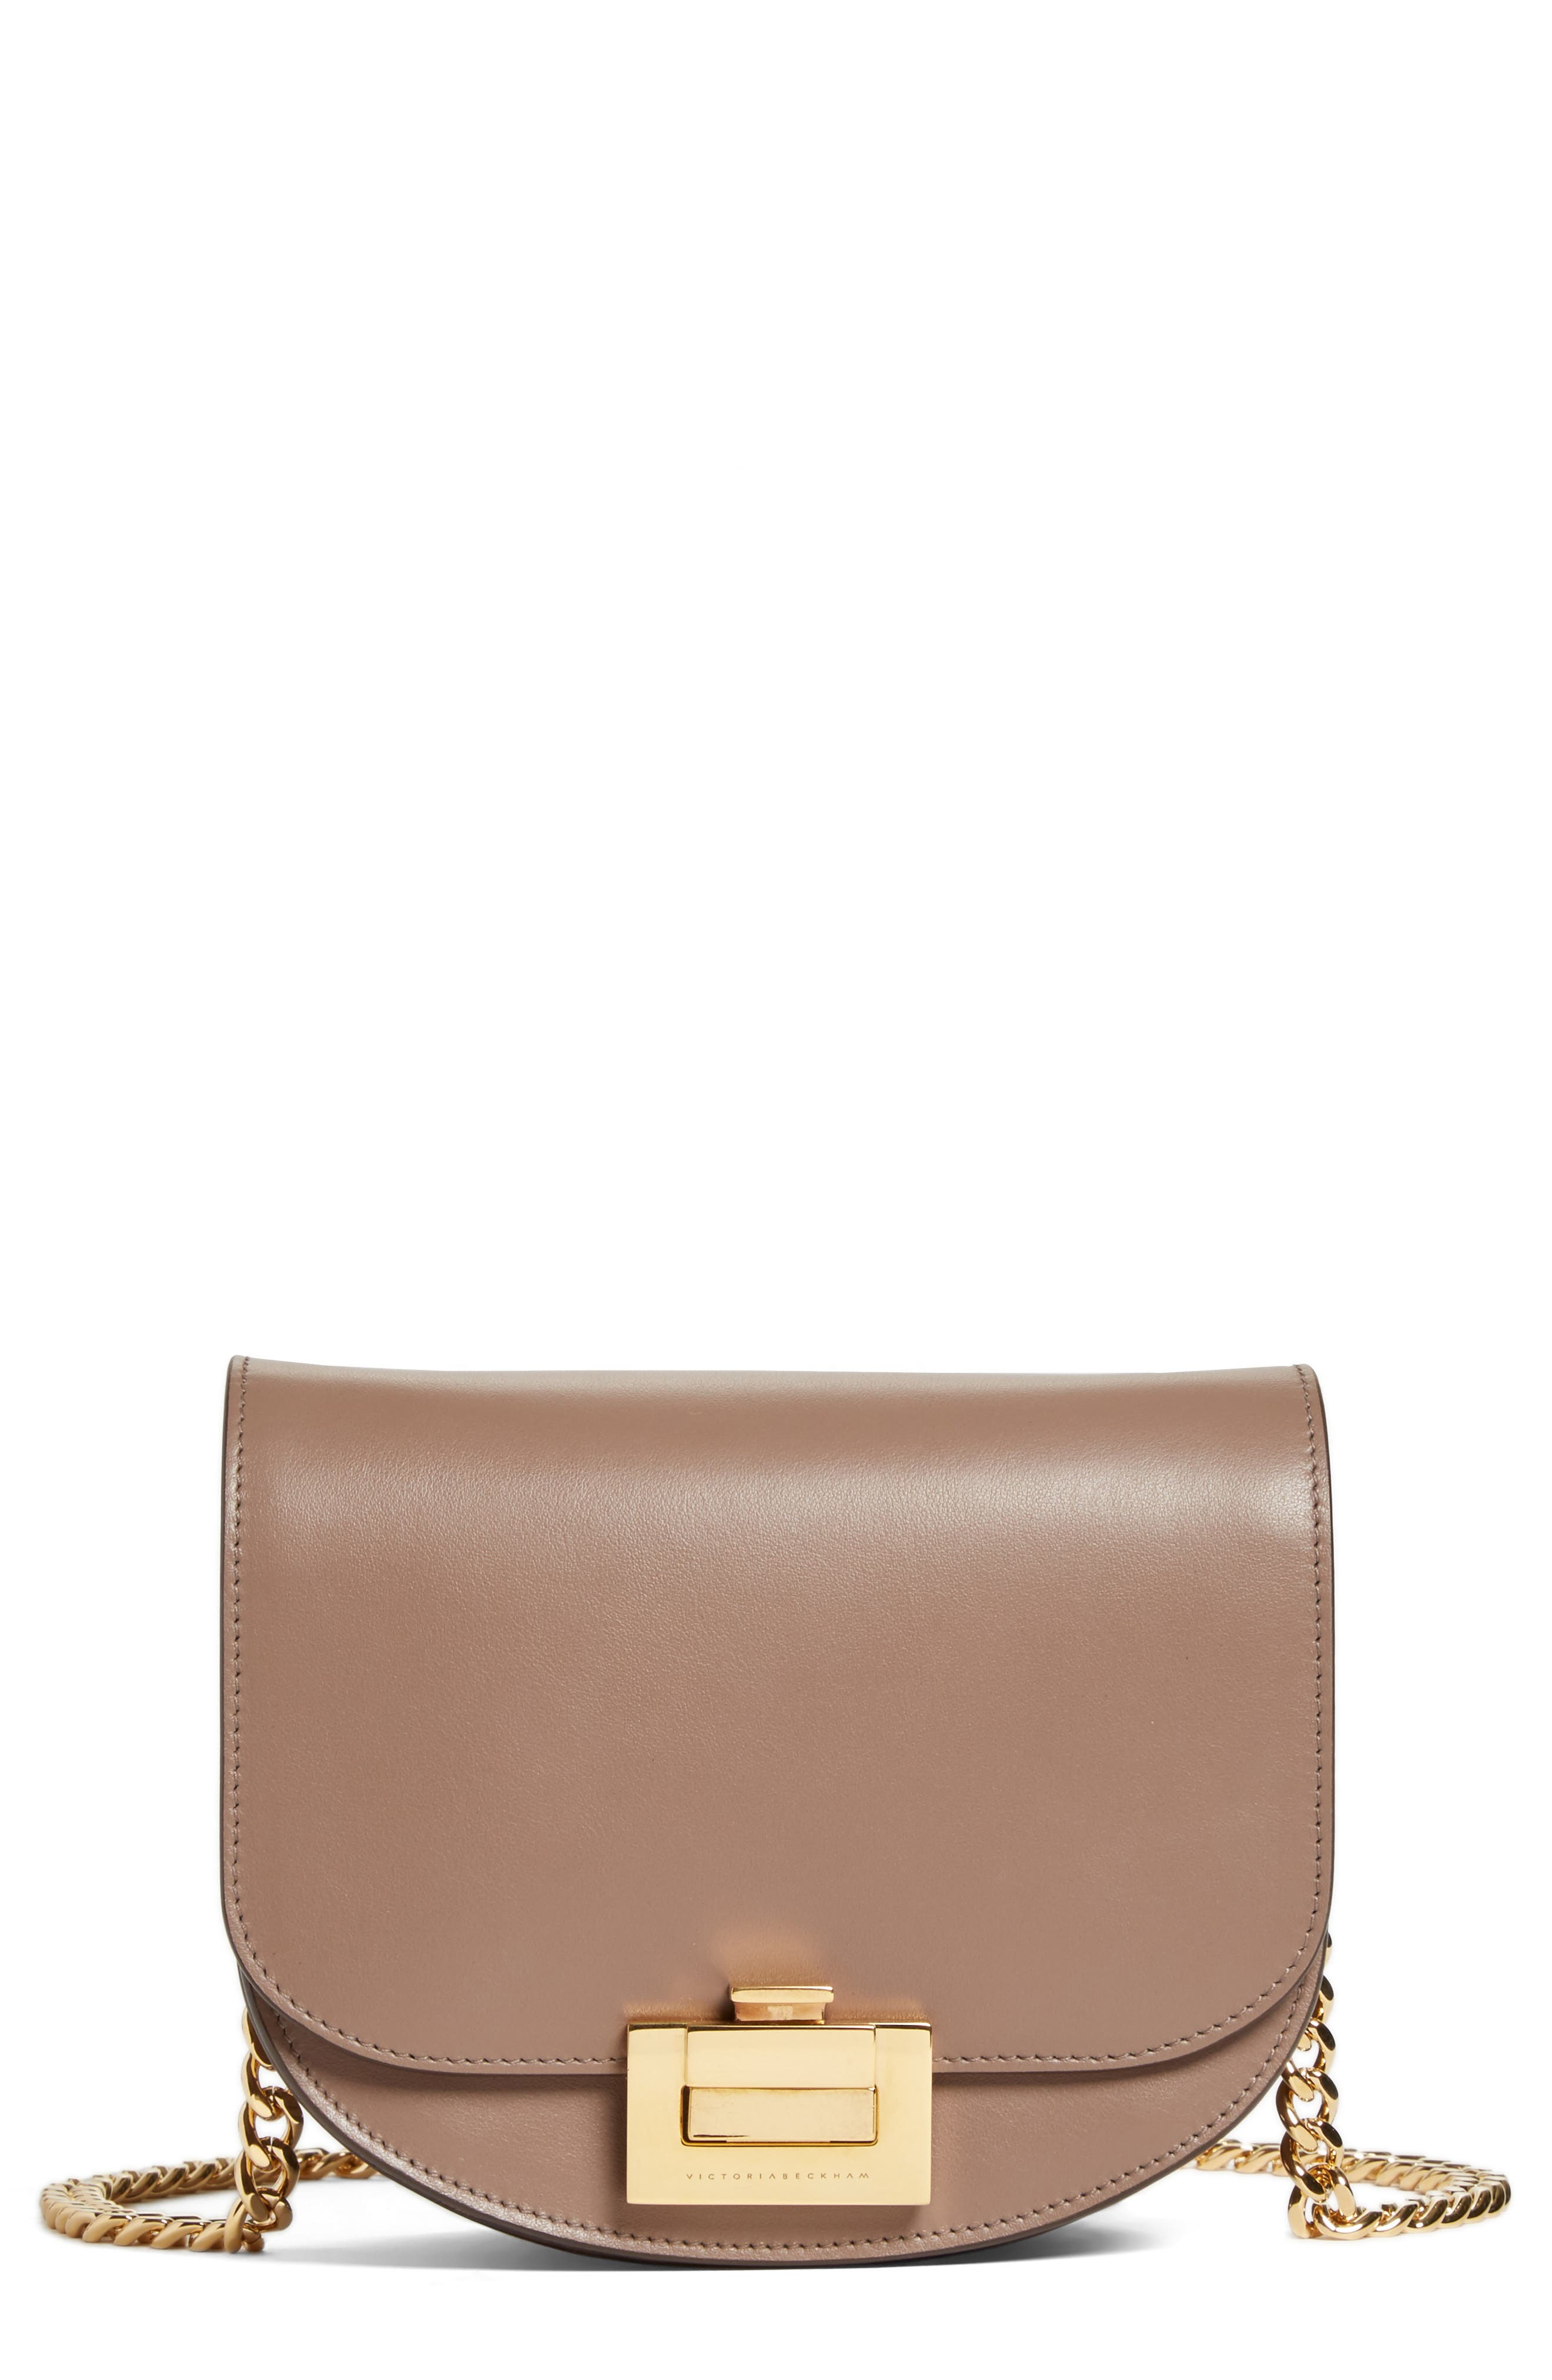 Medium Box Leather Shoulder Bag,                         Main,                         color, 200